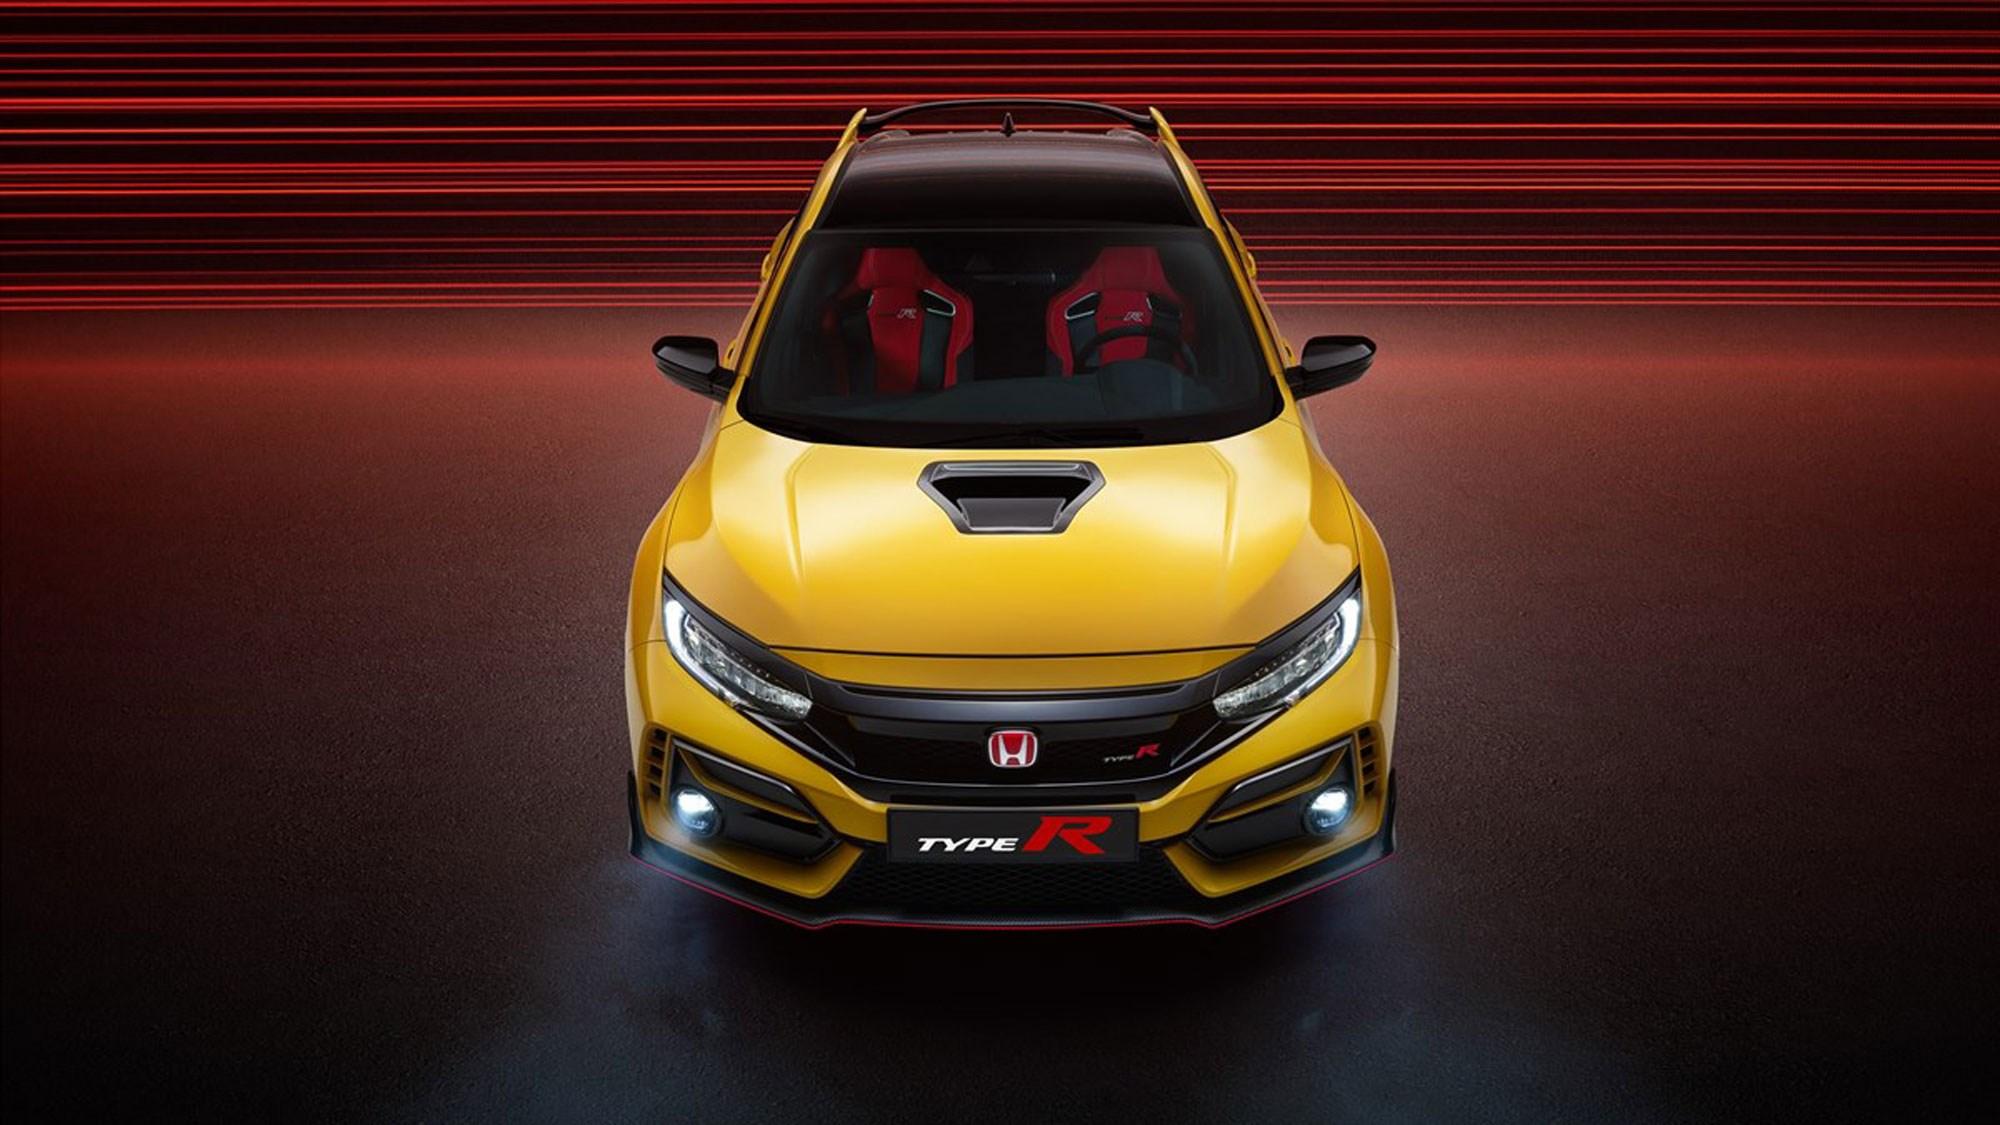 Honda Civic Type R: extreme Limited Edition revealed